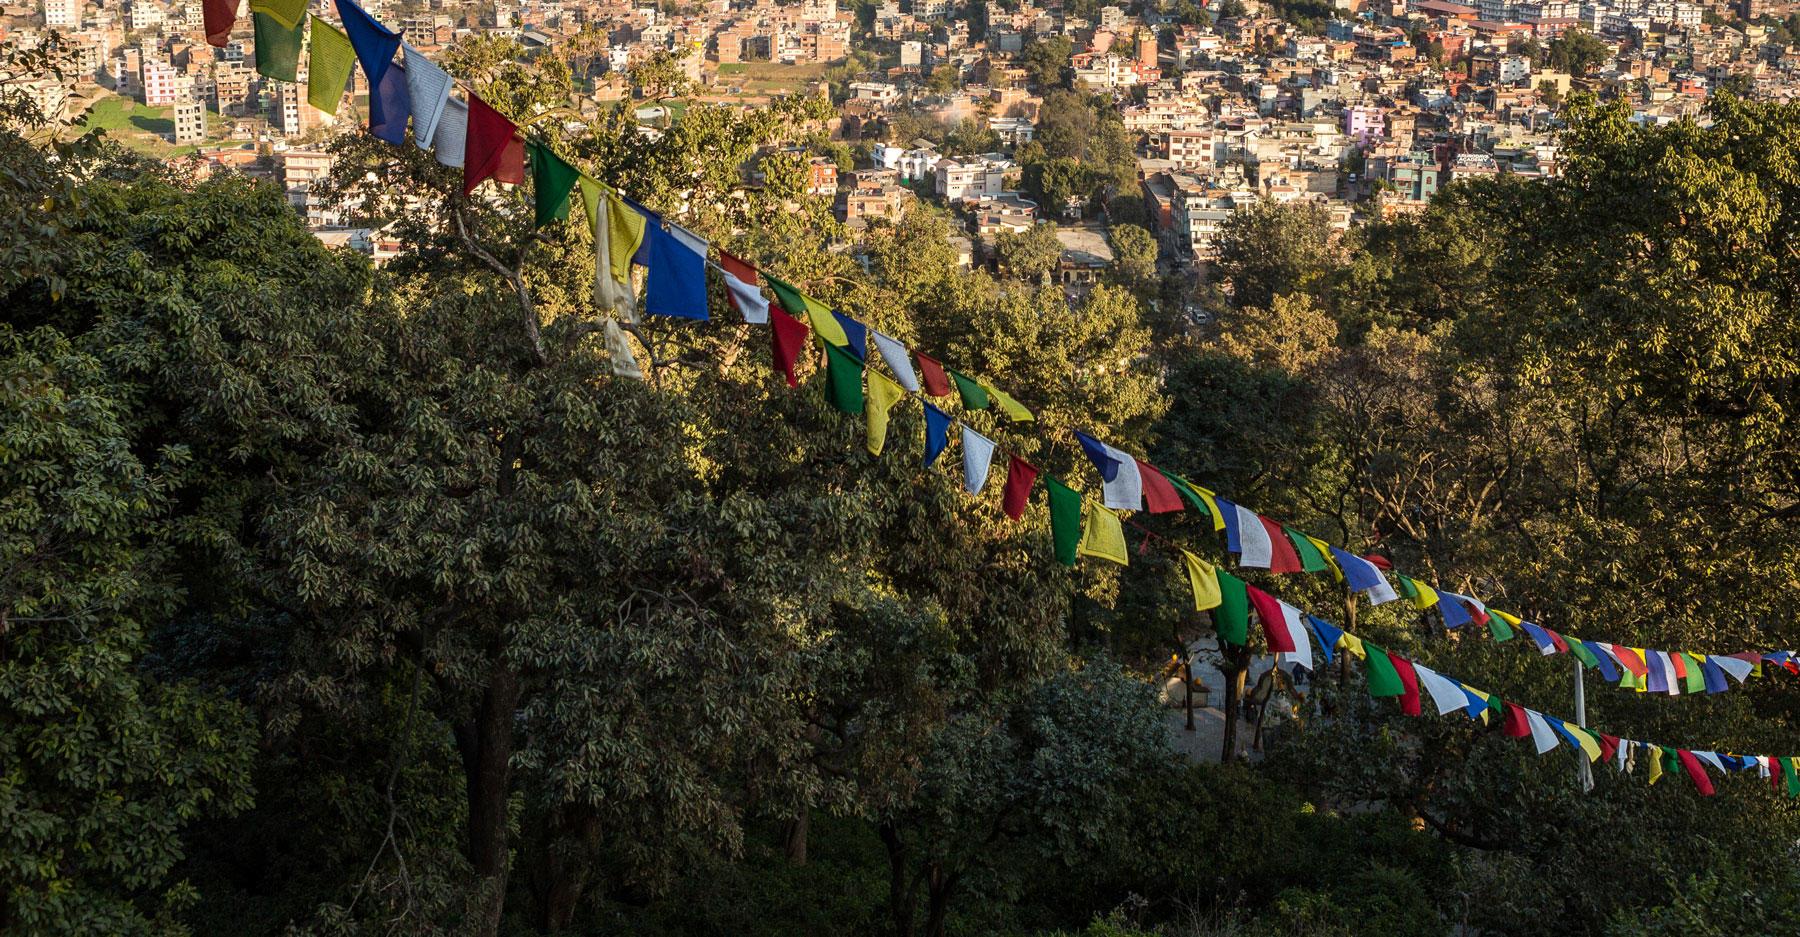 Prayer flags over Kathmandu